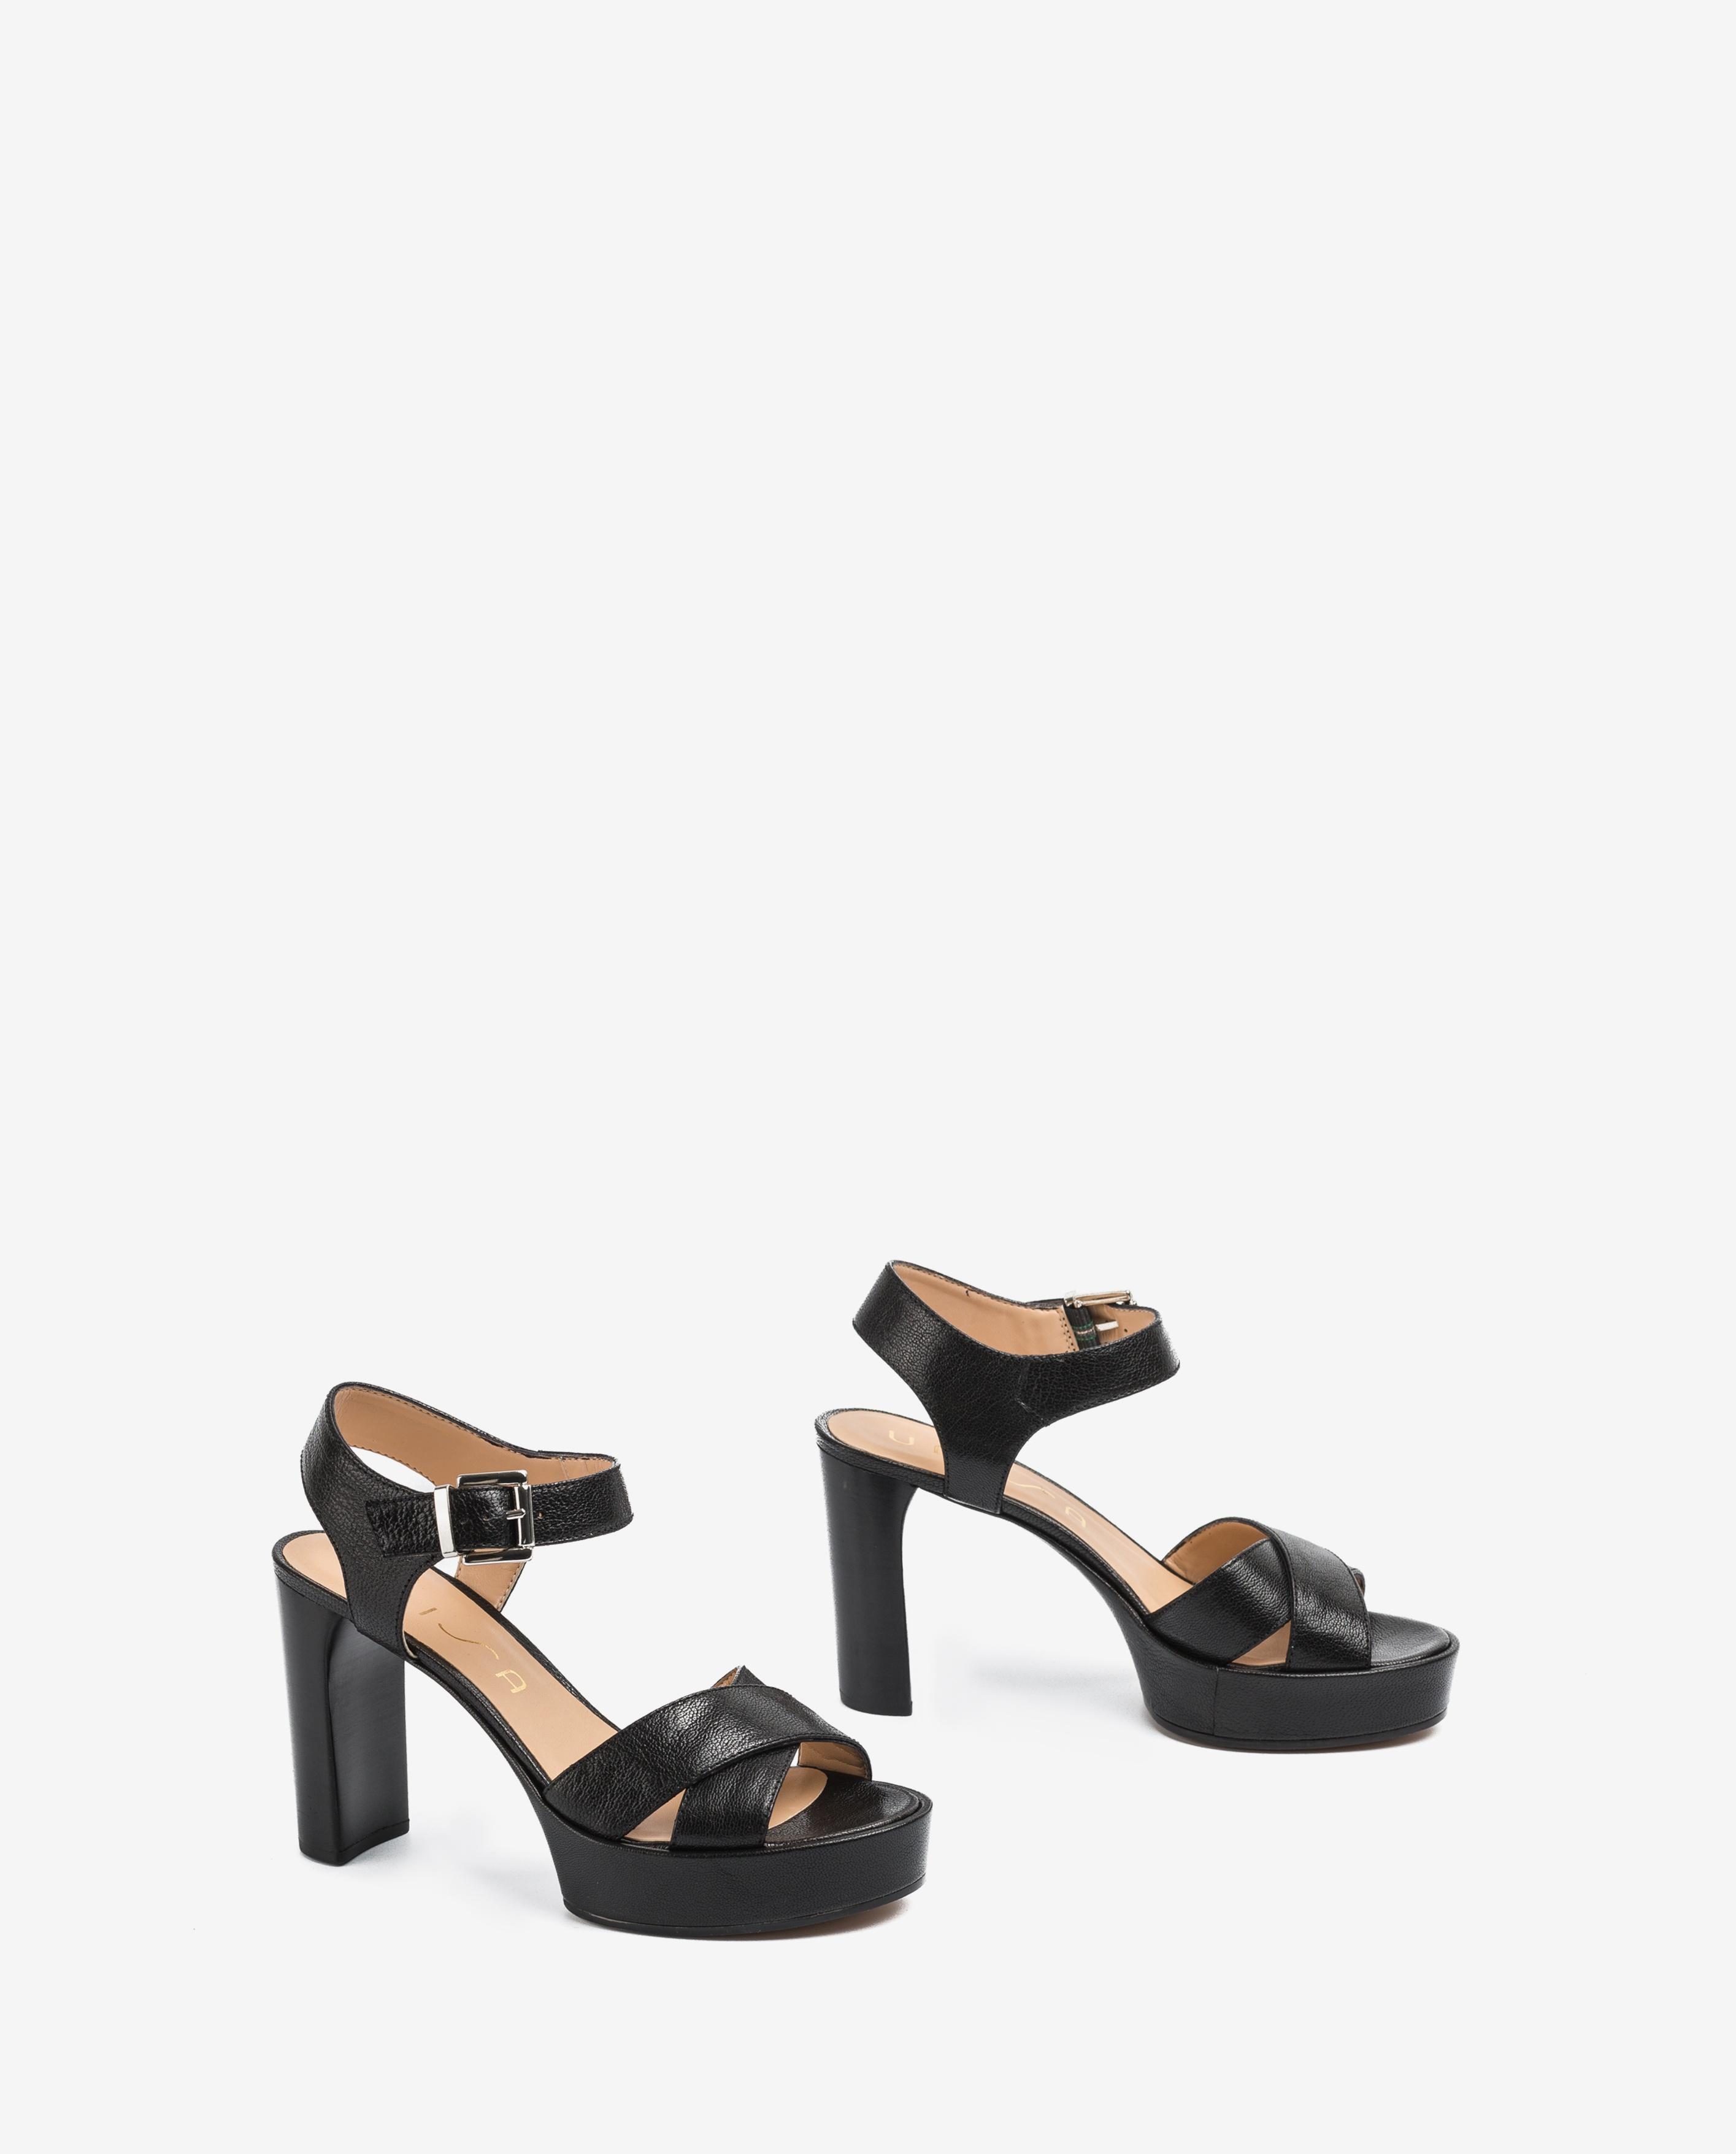 UNISA Sandale cuir talon bois VIKEN_20_GCR black 3